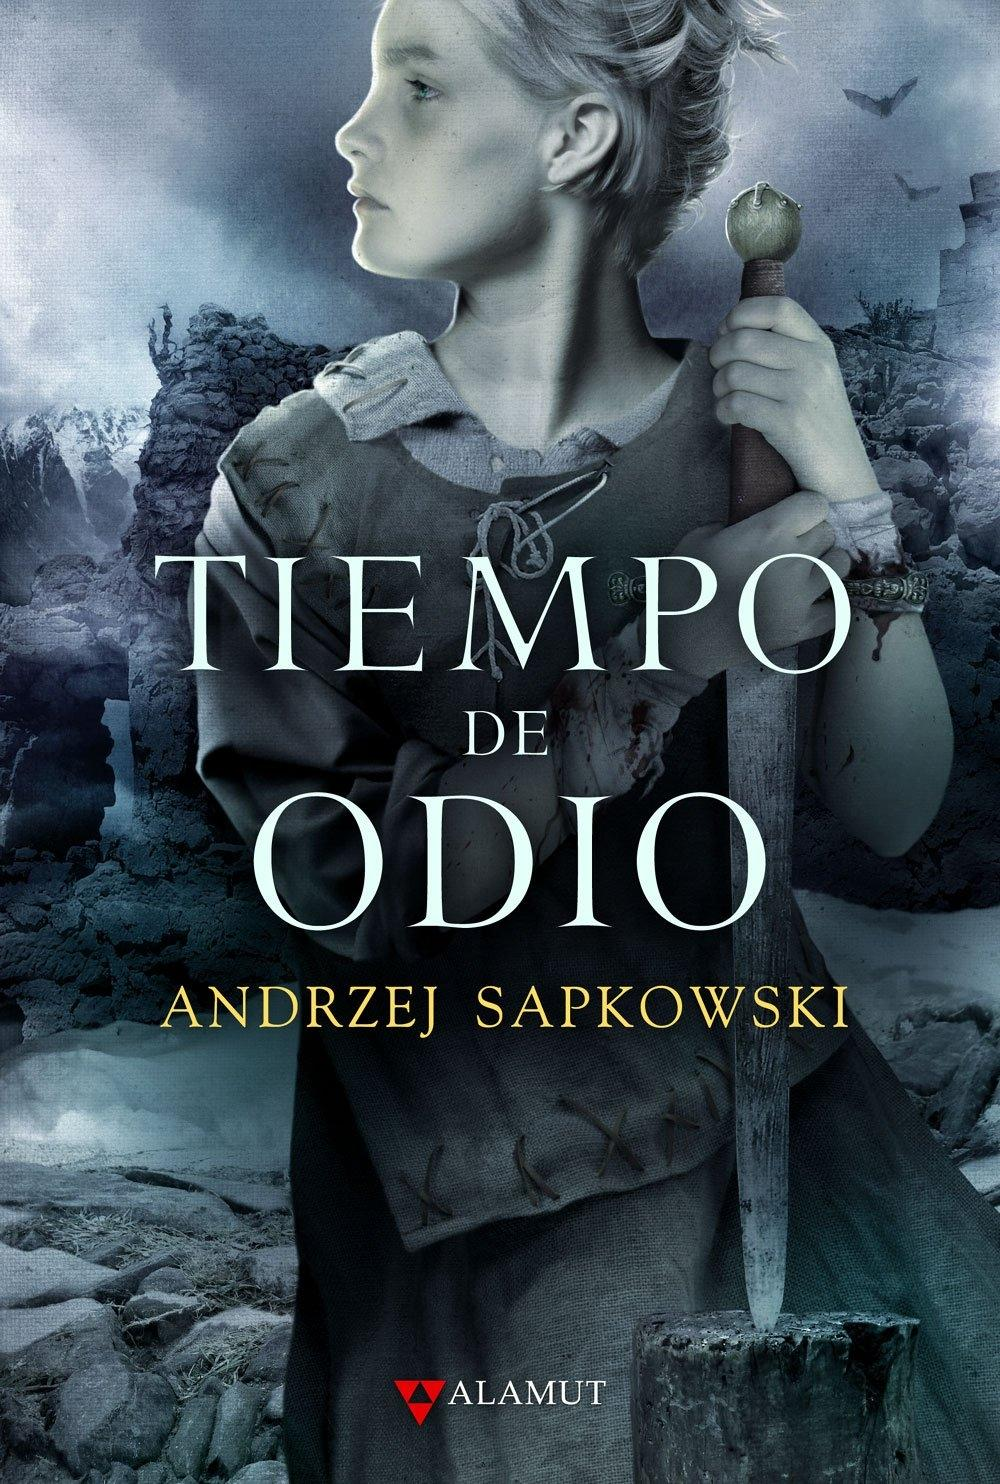 http://labibliotecadebella.blogspot.com.es/2017/02/tiempo-de-odio-andrzej-sapkowski.html